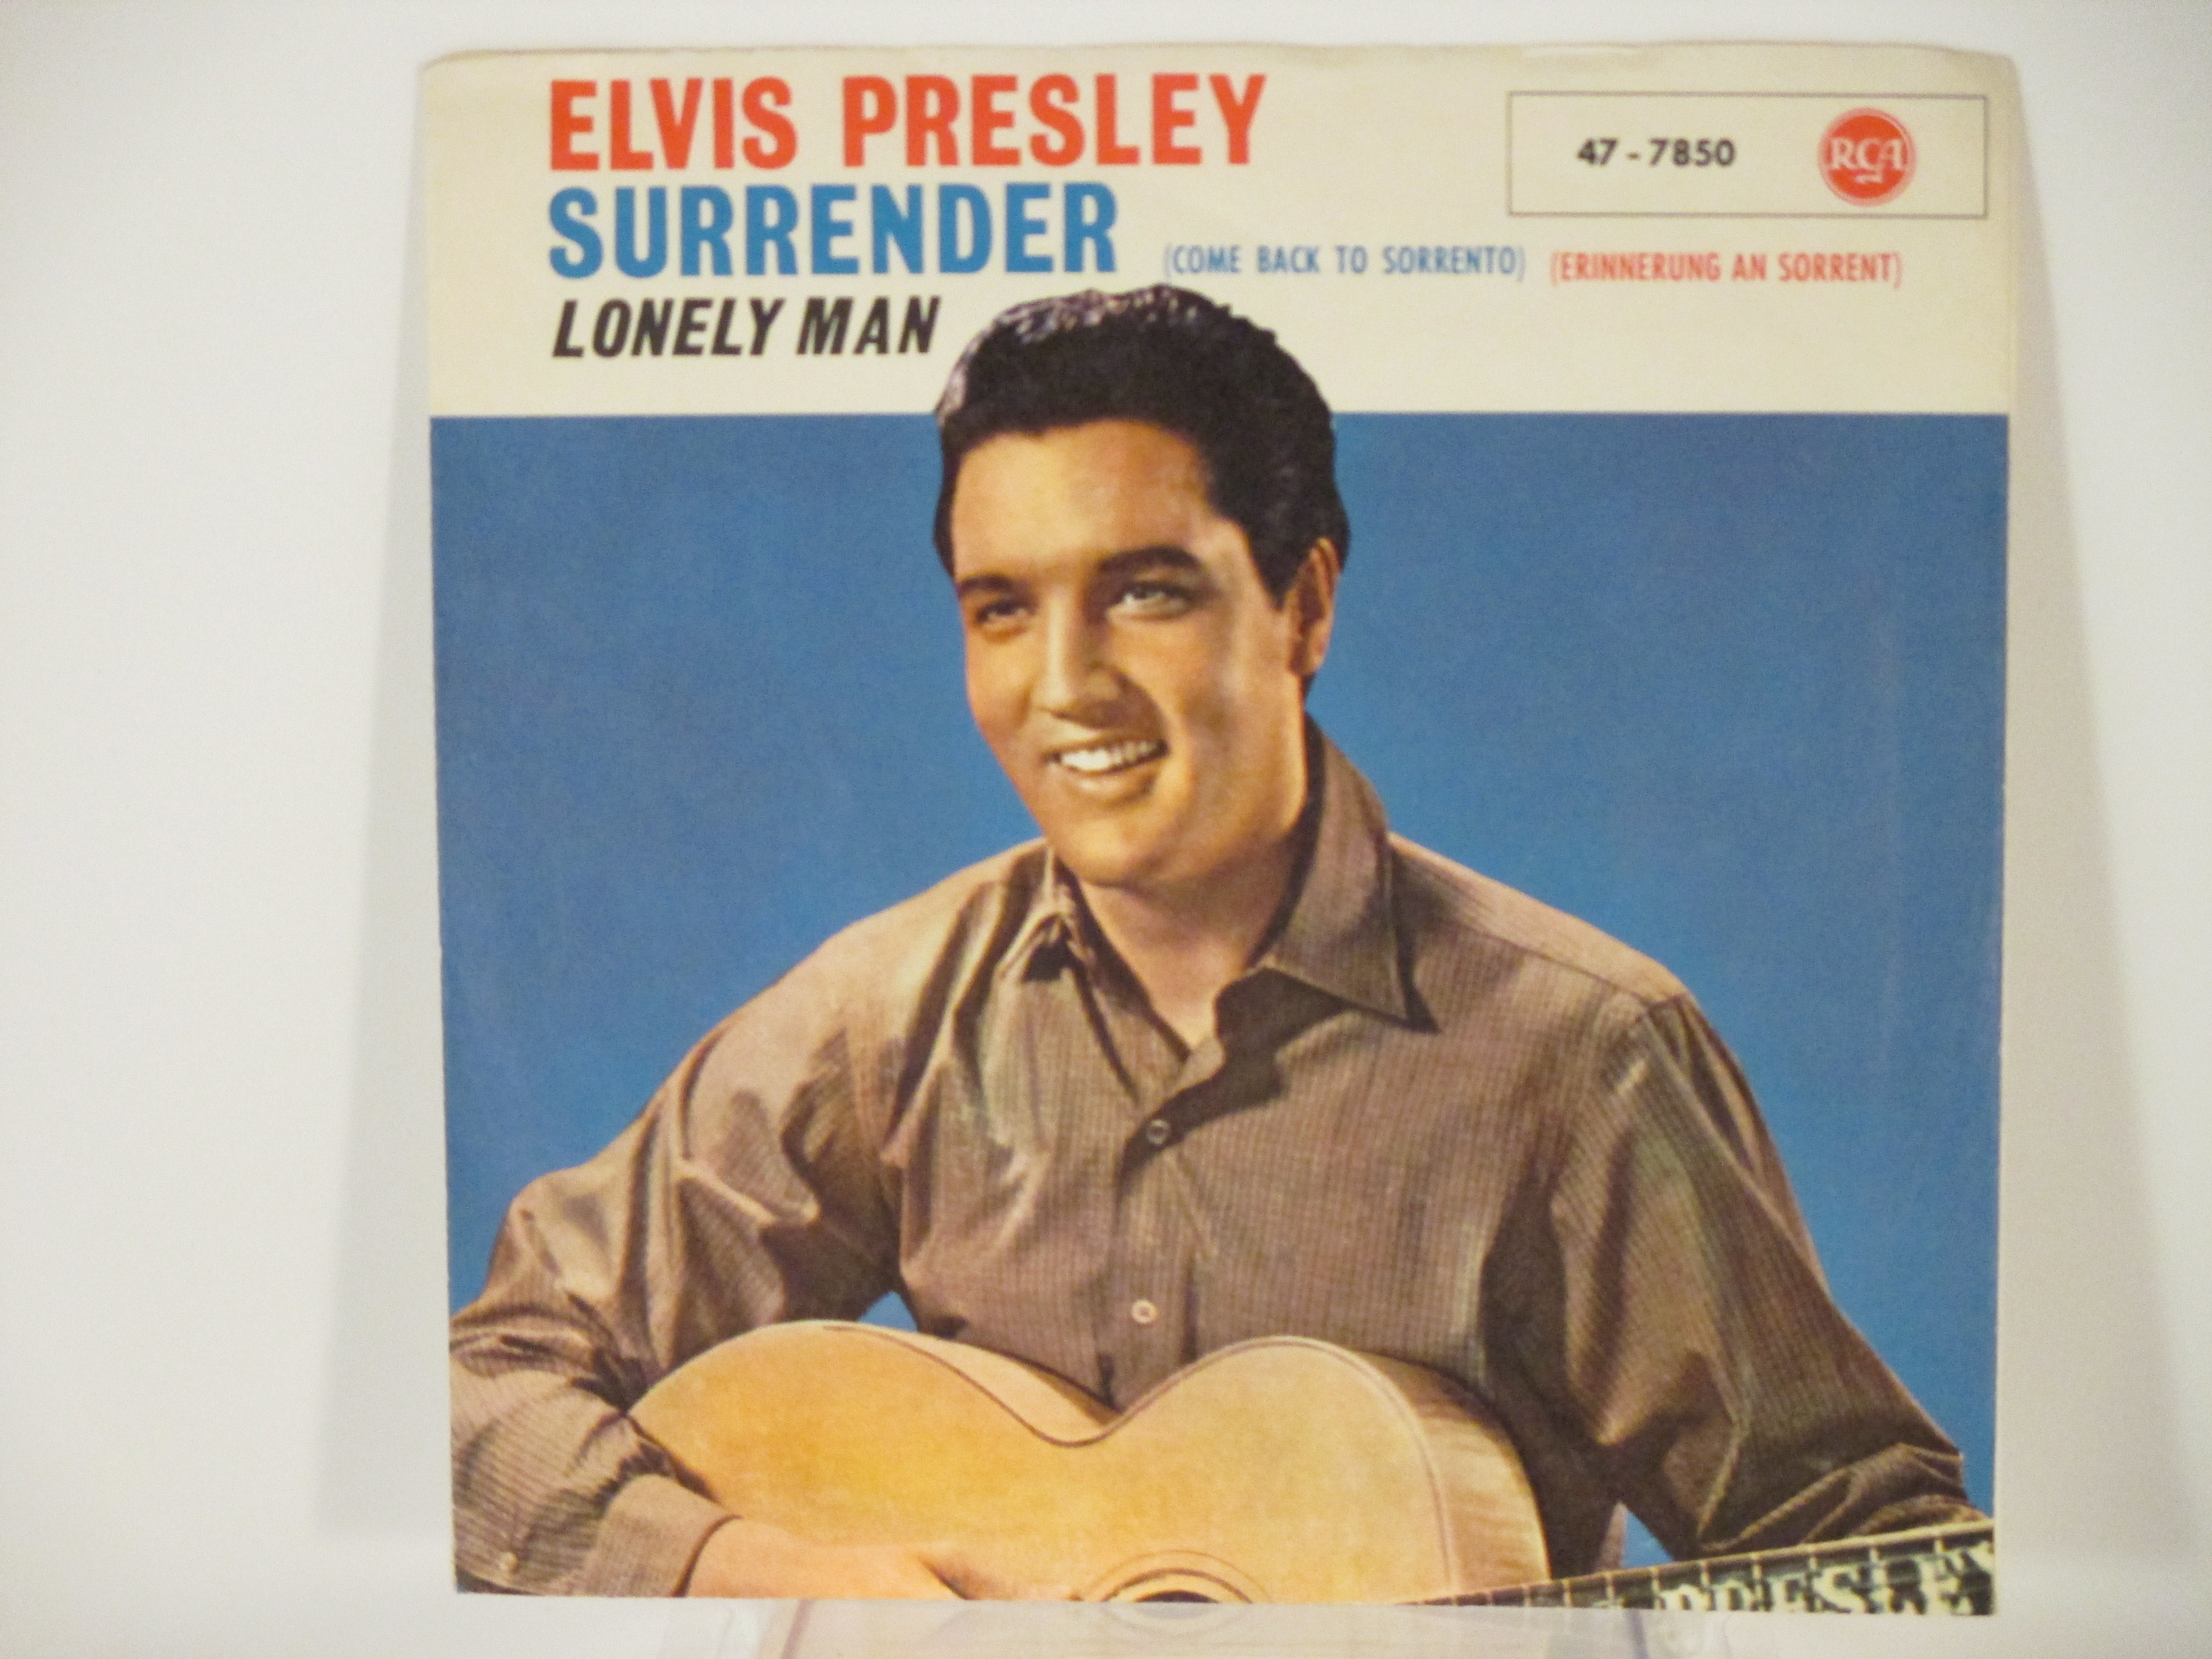 ELVIS PRESLEY : Surrender / Lonely man